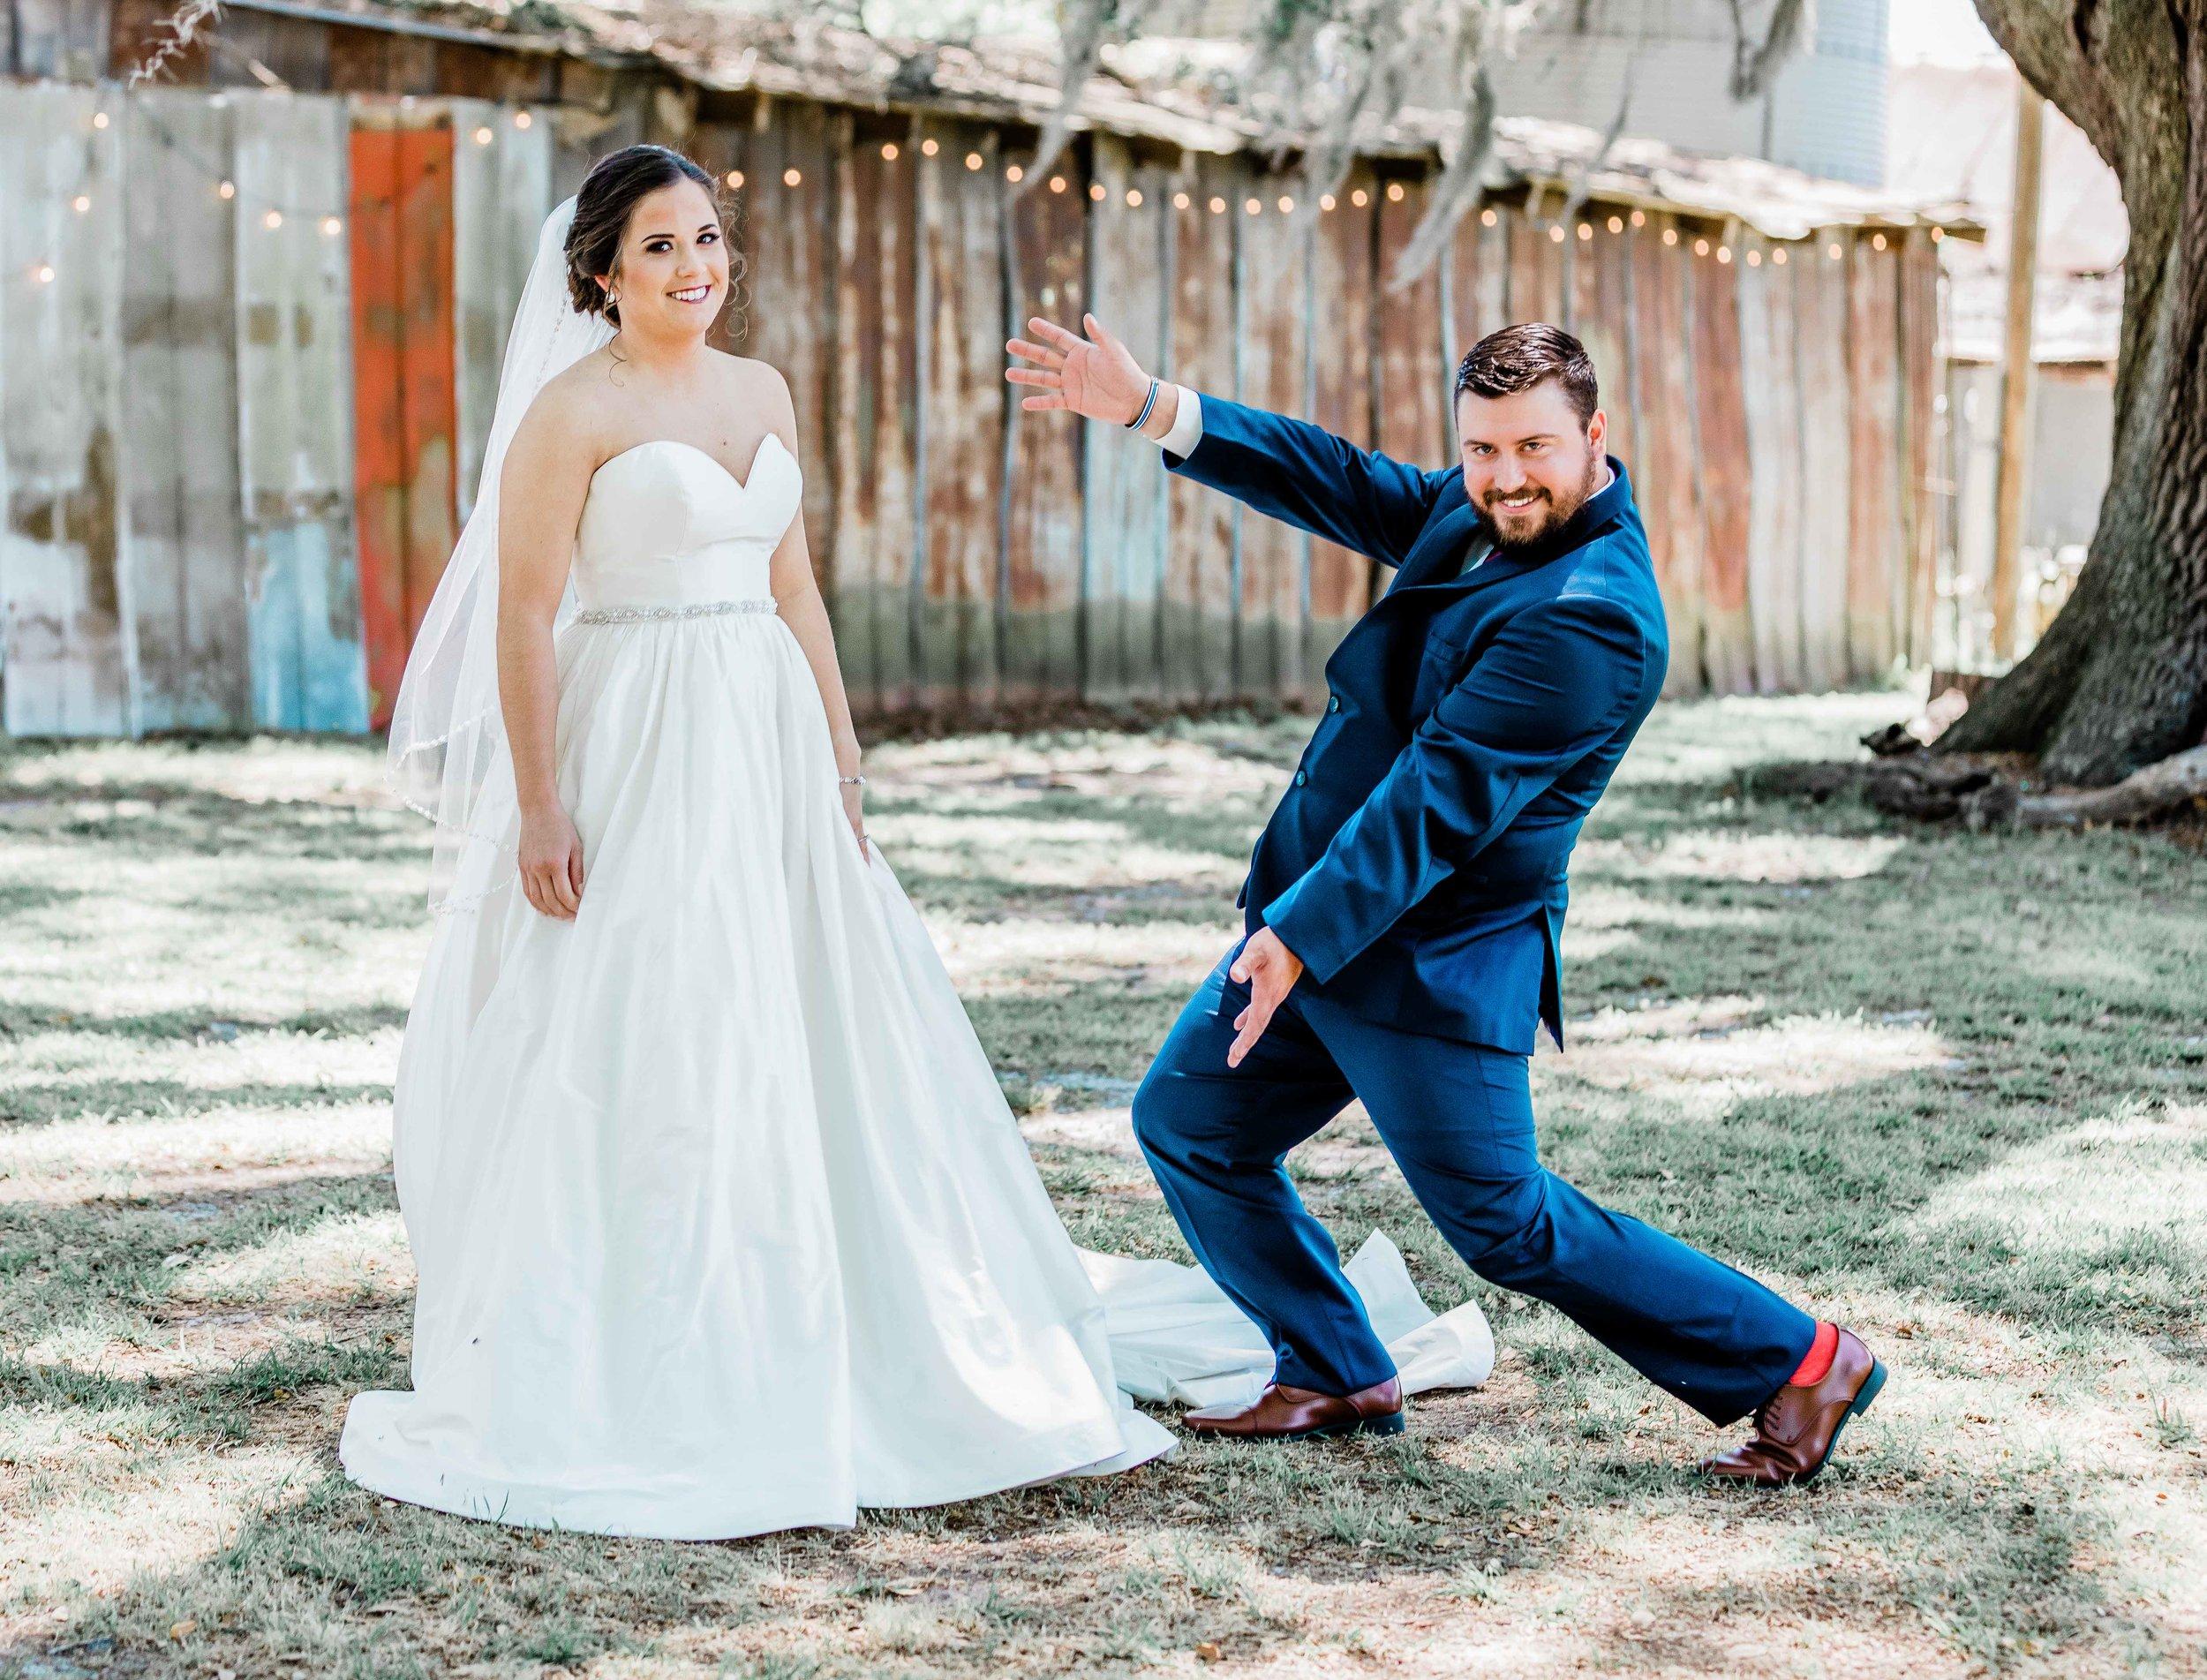 20190427-Southern Lens Photography- Savannah Wedding Photographer-Screven and Caroline-201937.jpg